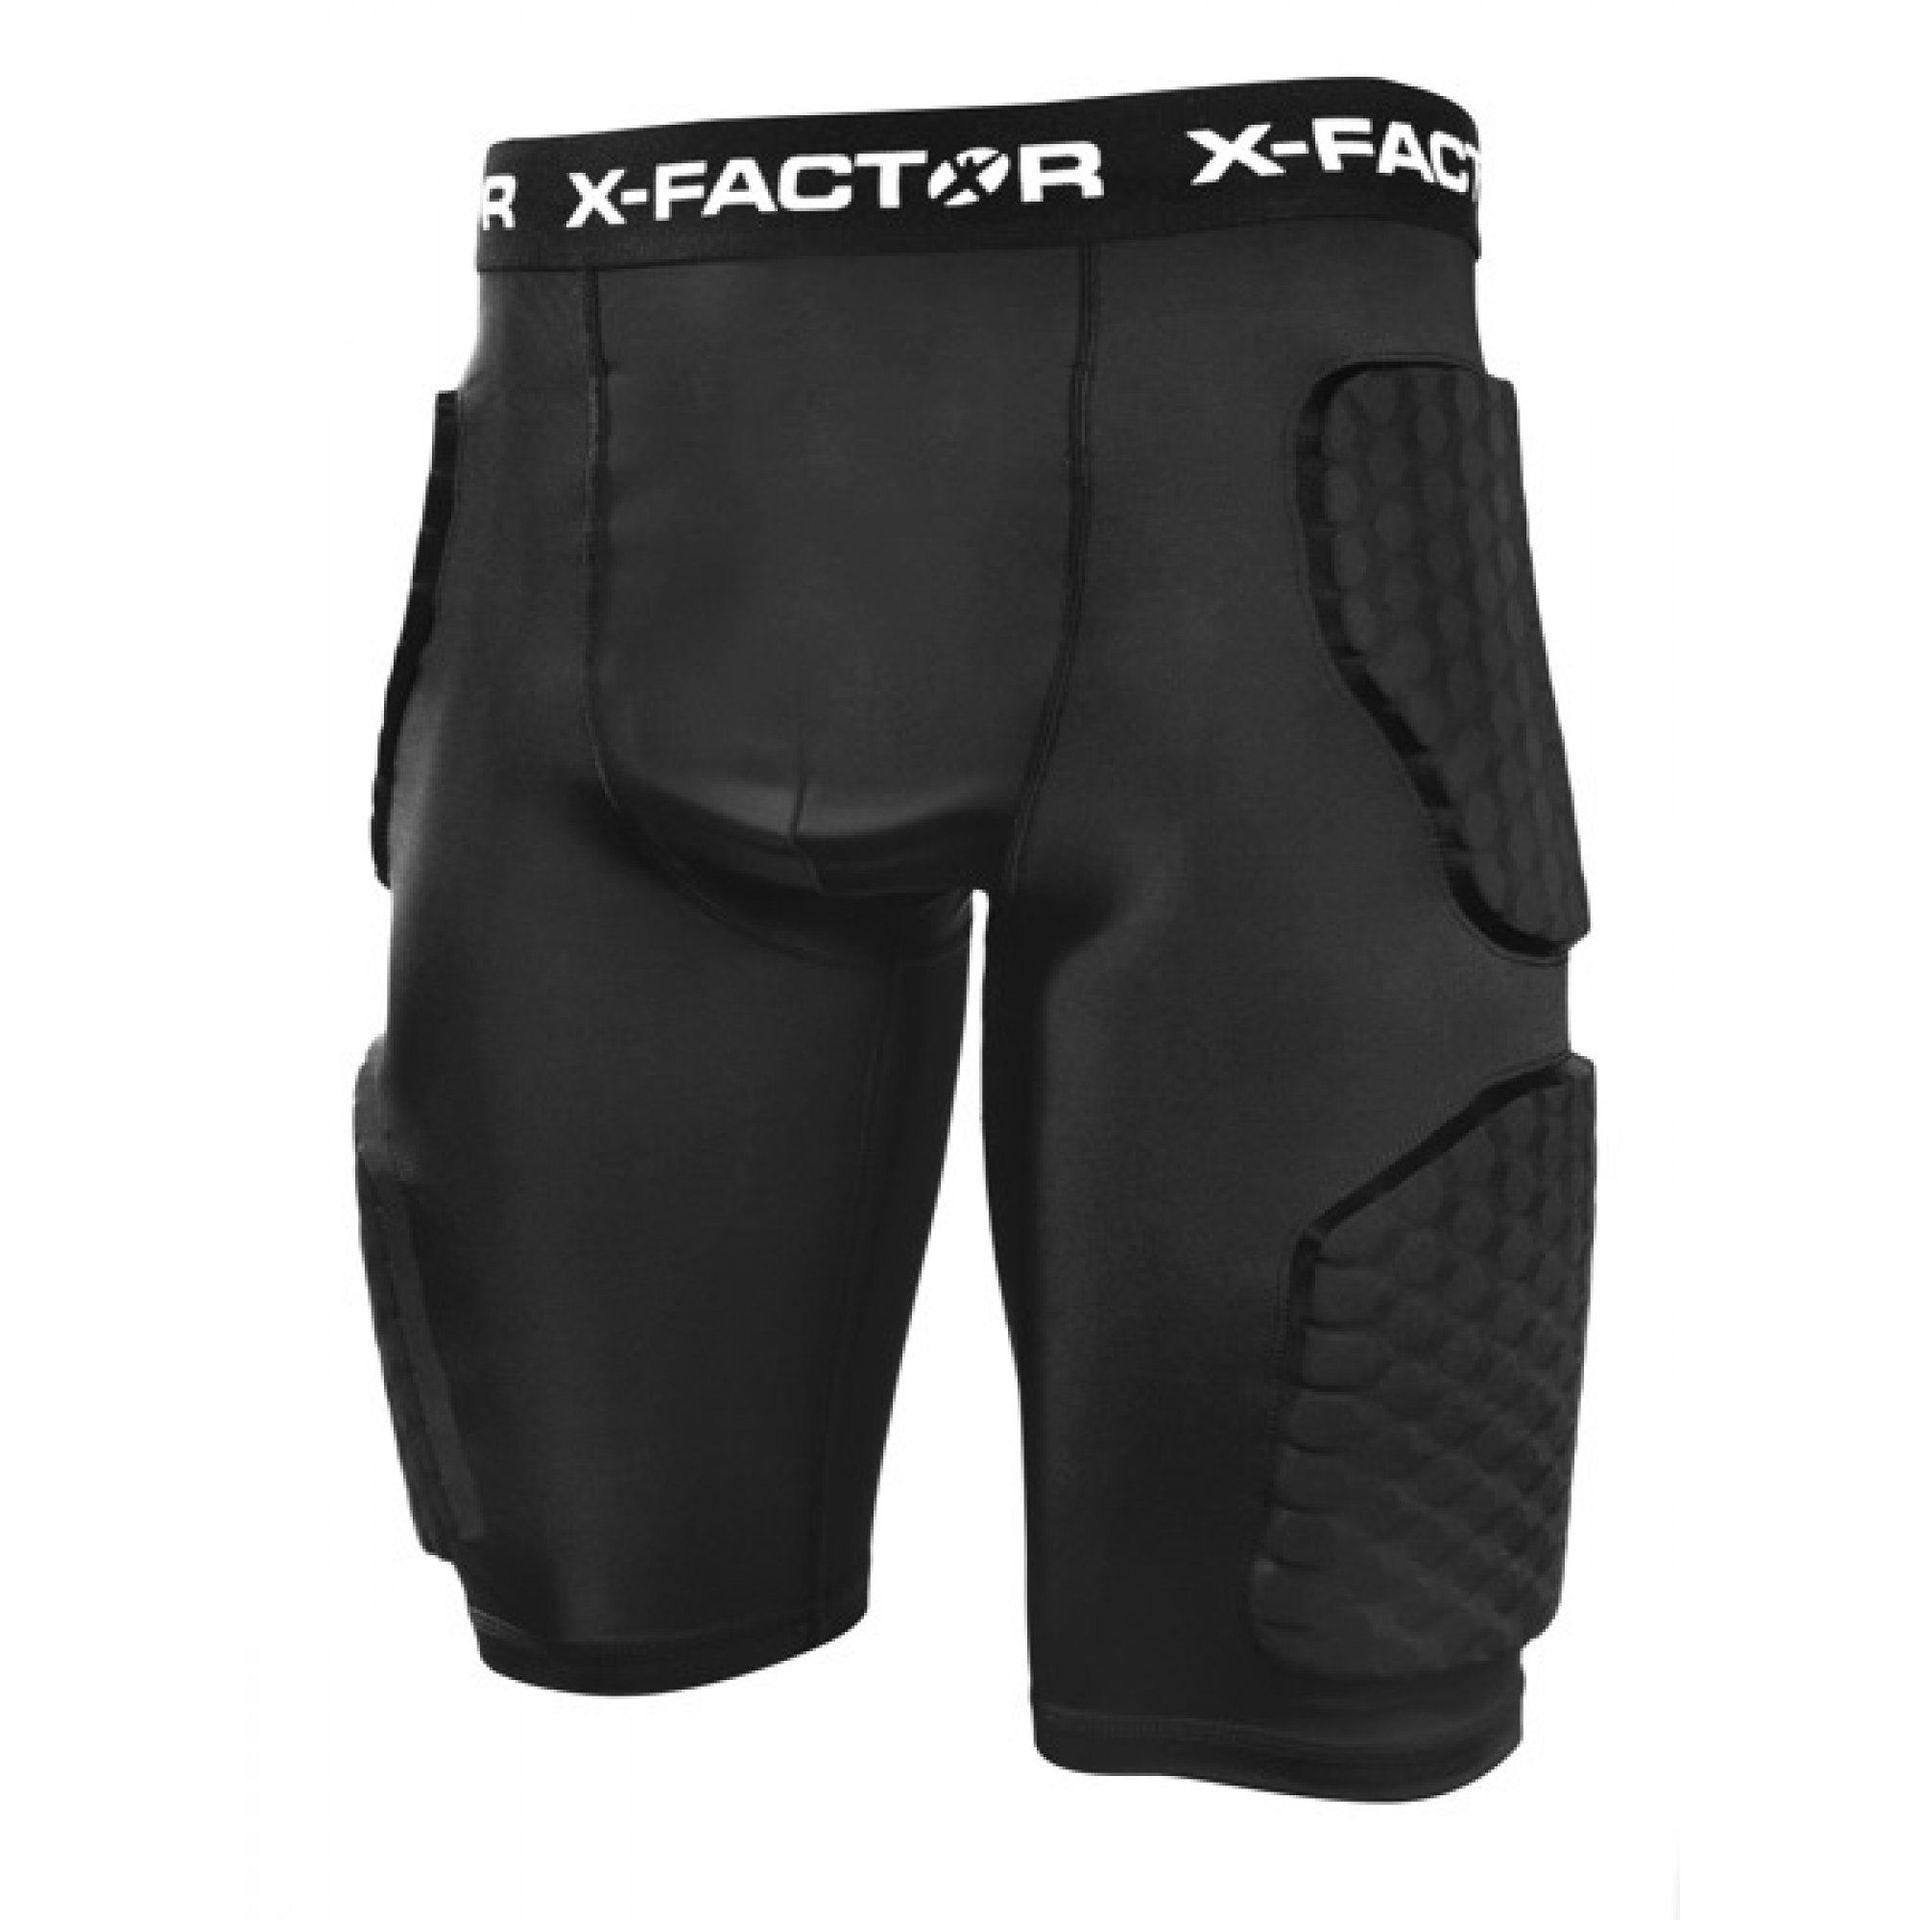 SPODENKI OCHRONNE X-FACTOR QBI BLACK 1